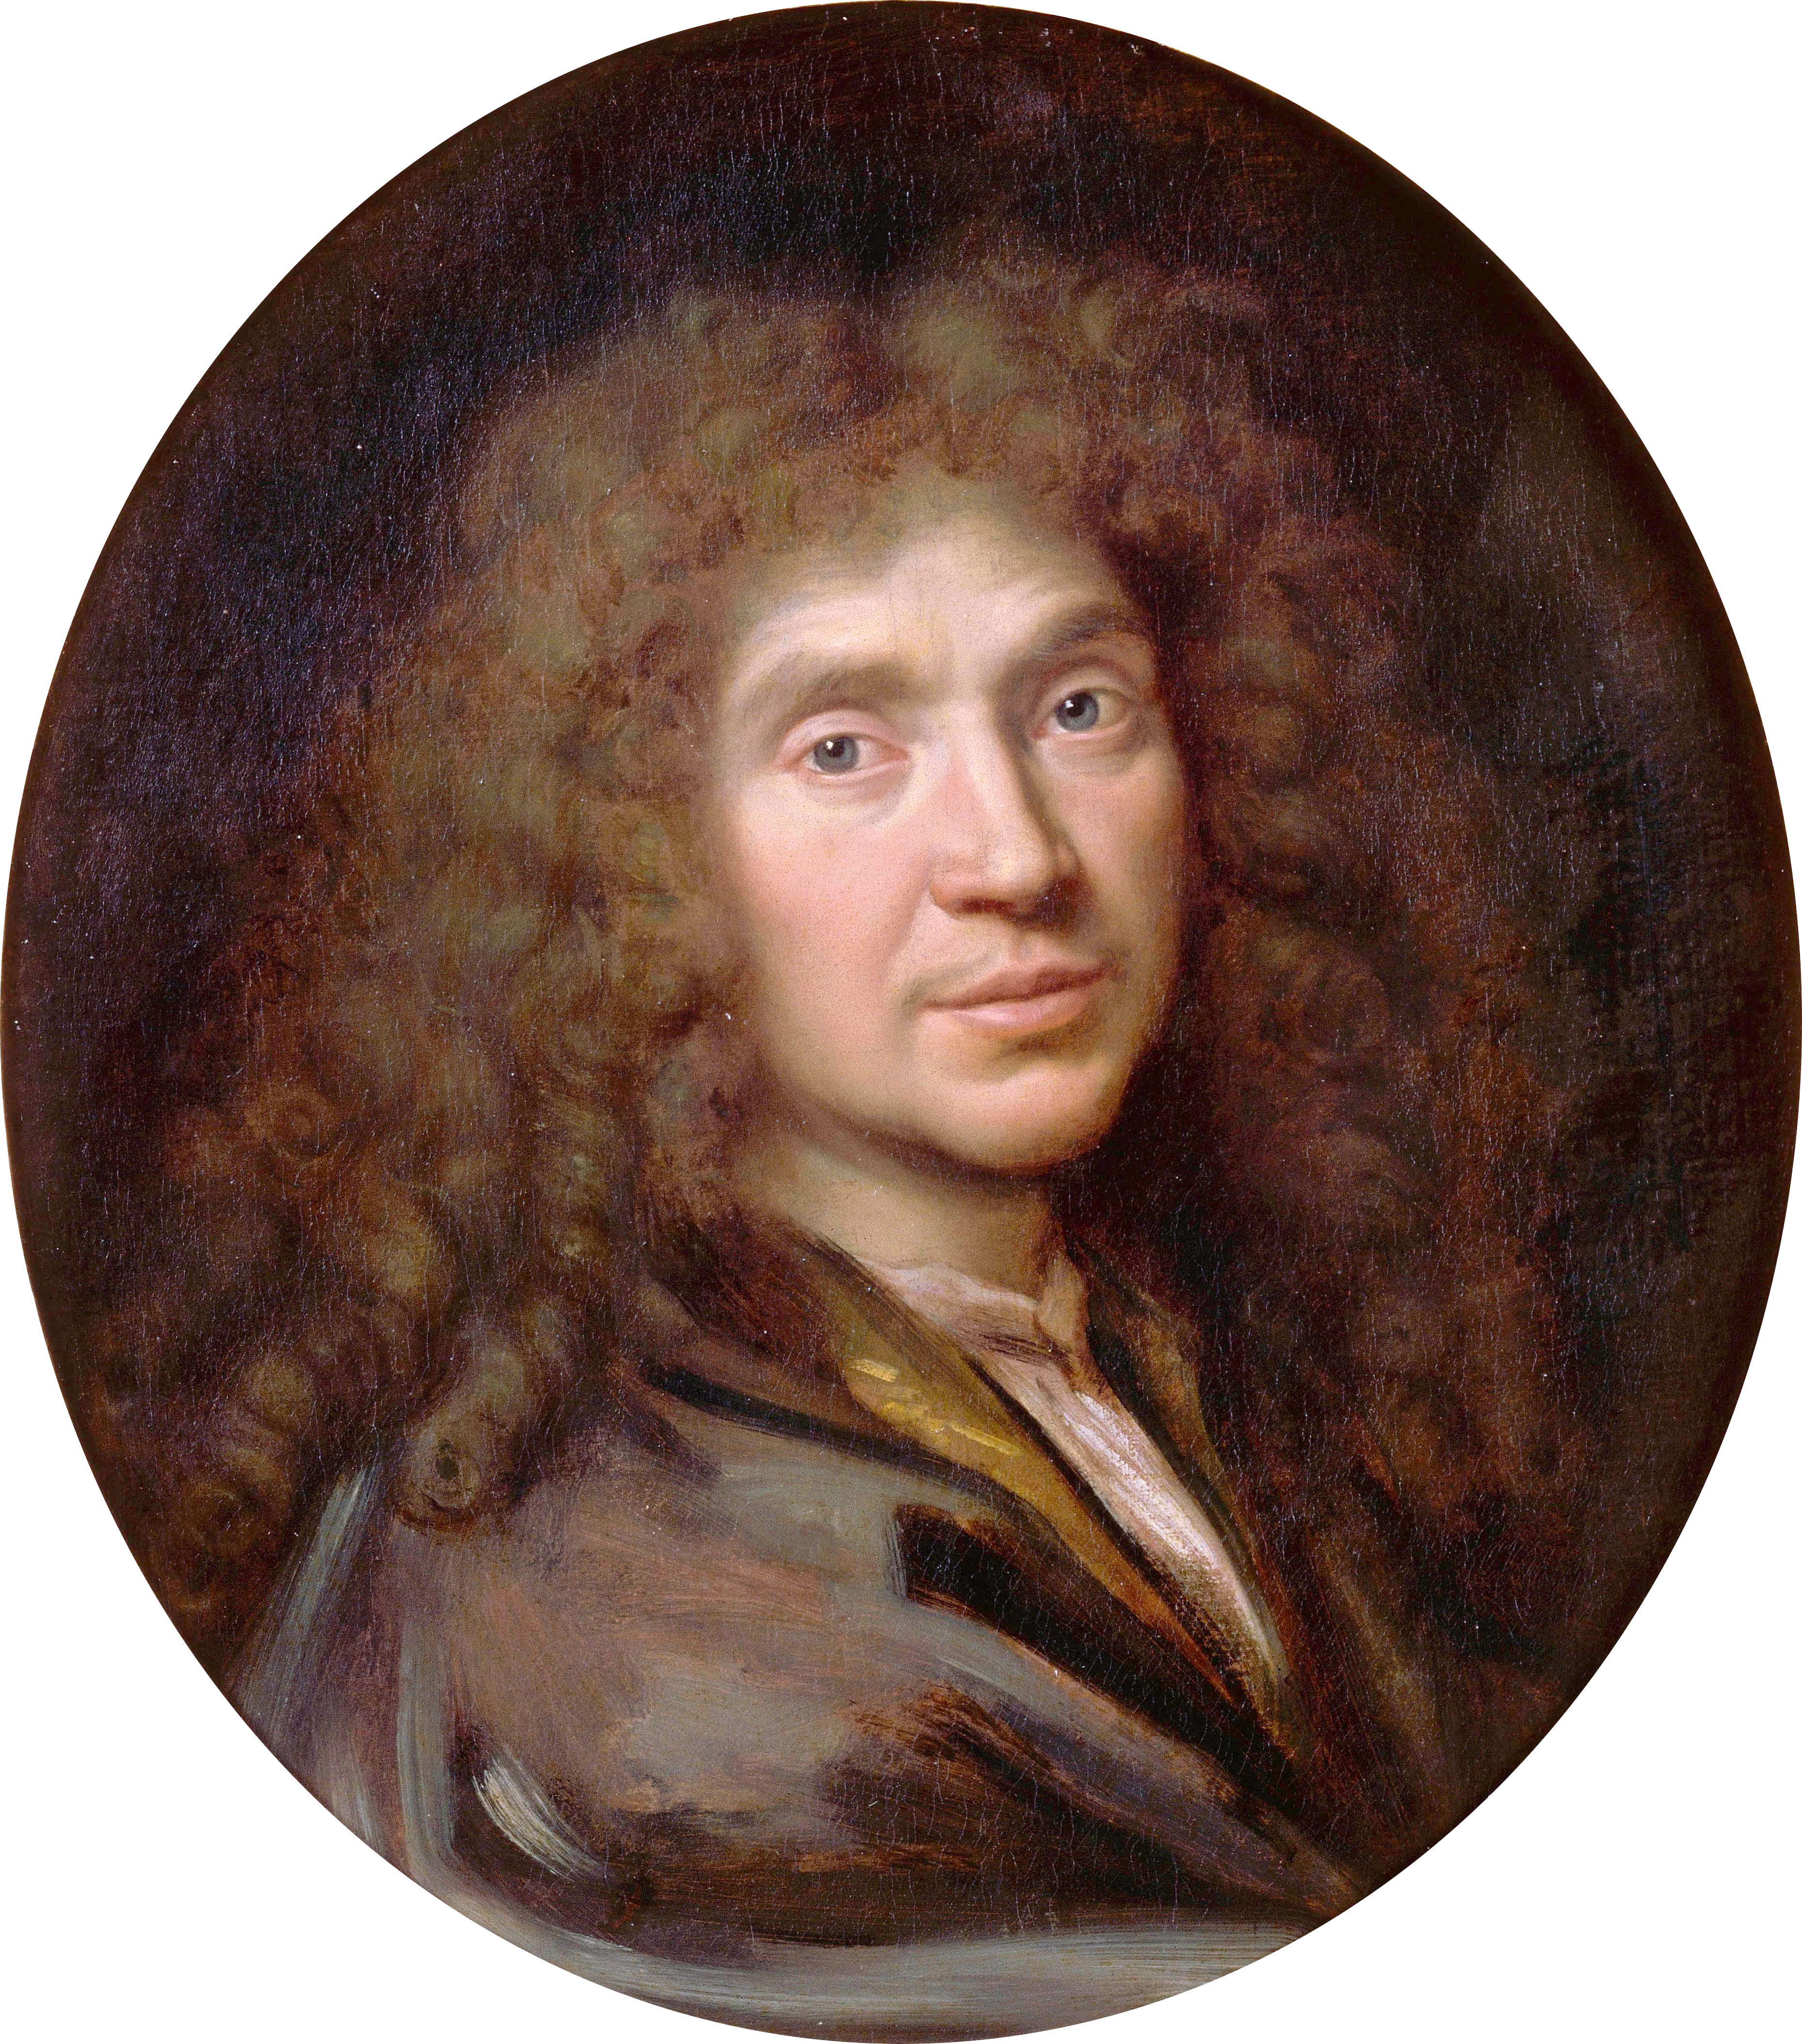 Portrait of Molière by [[Pierre Mignard]] (ca. 1658)